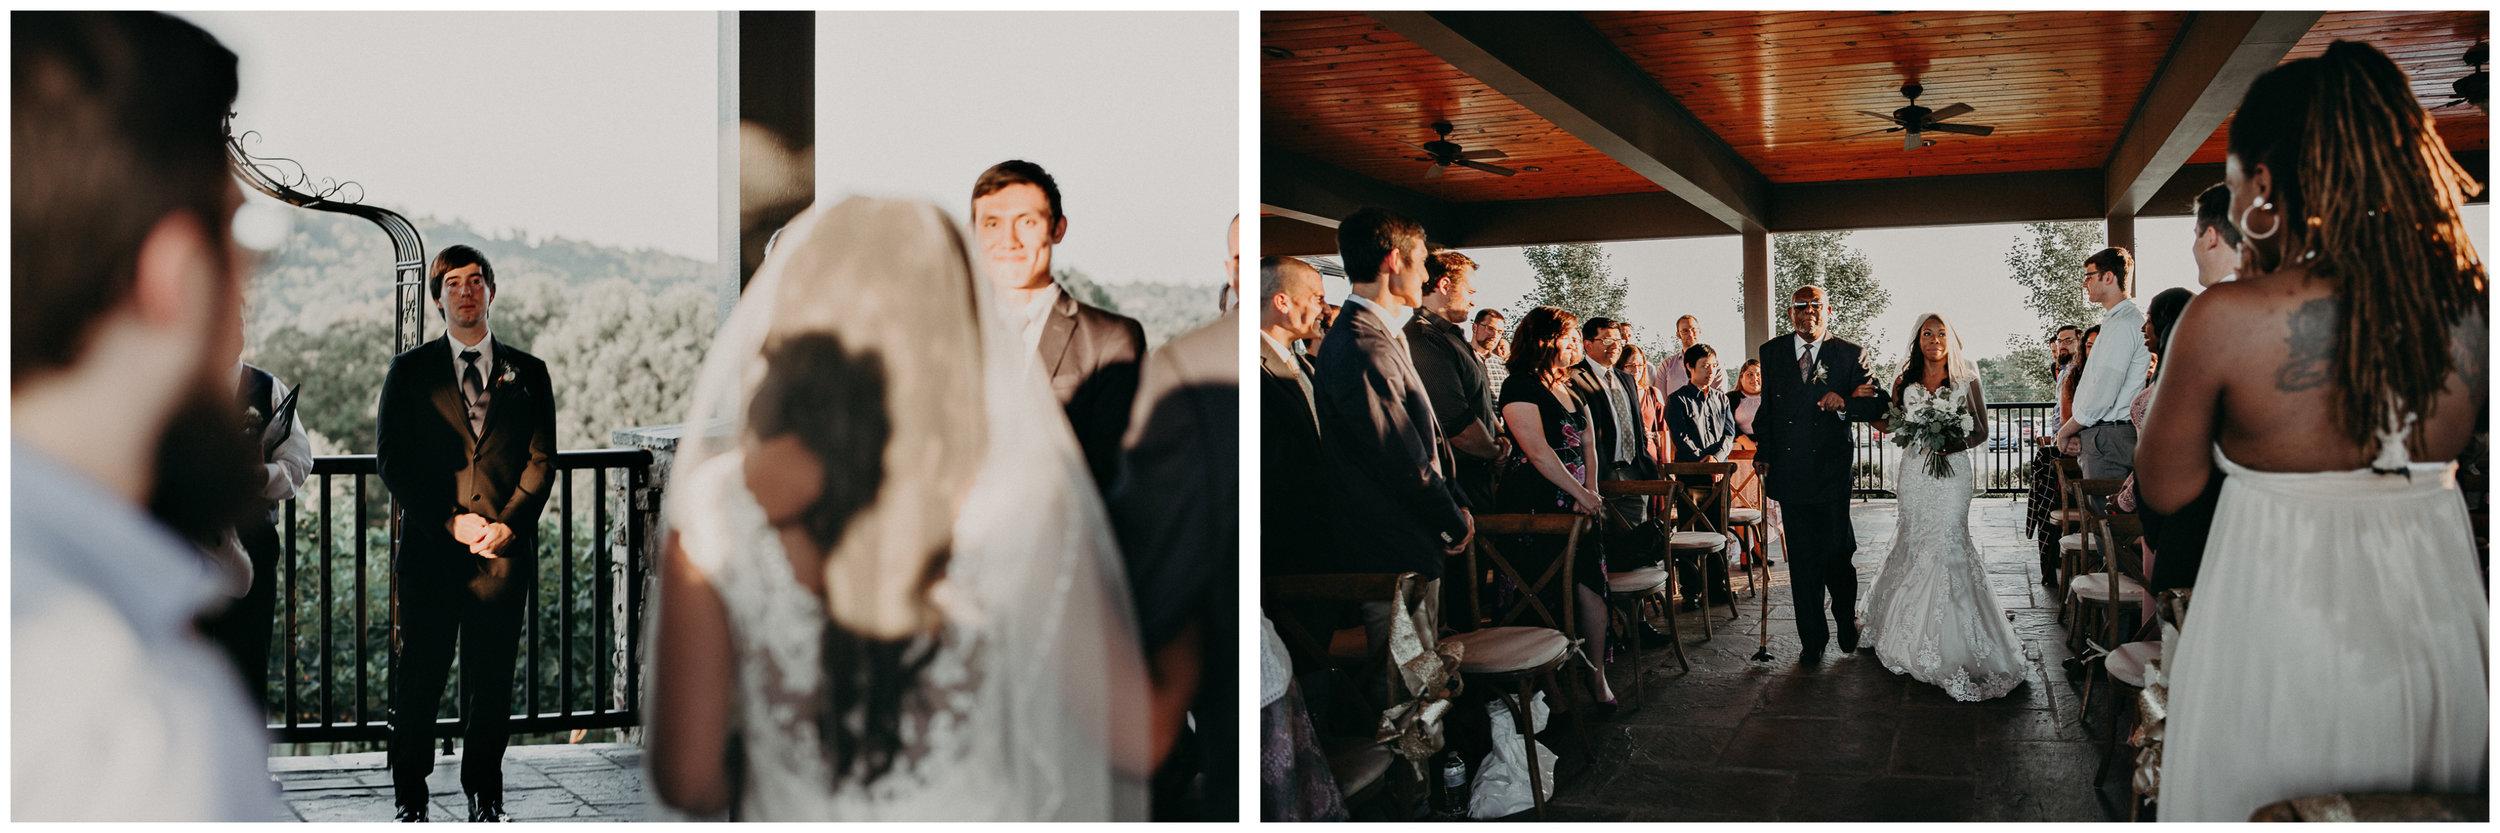 68- Kaya_vineyard_dahlonega_wedding_venue_ceremony_aline_marin_photography.jpg